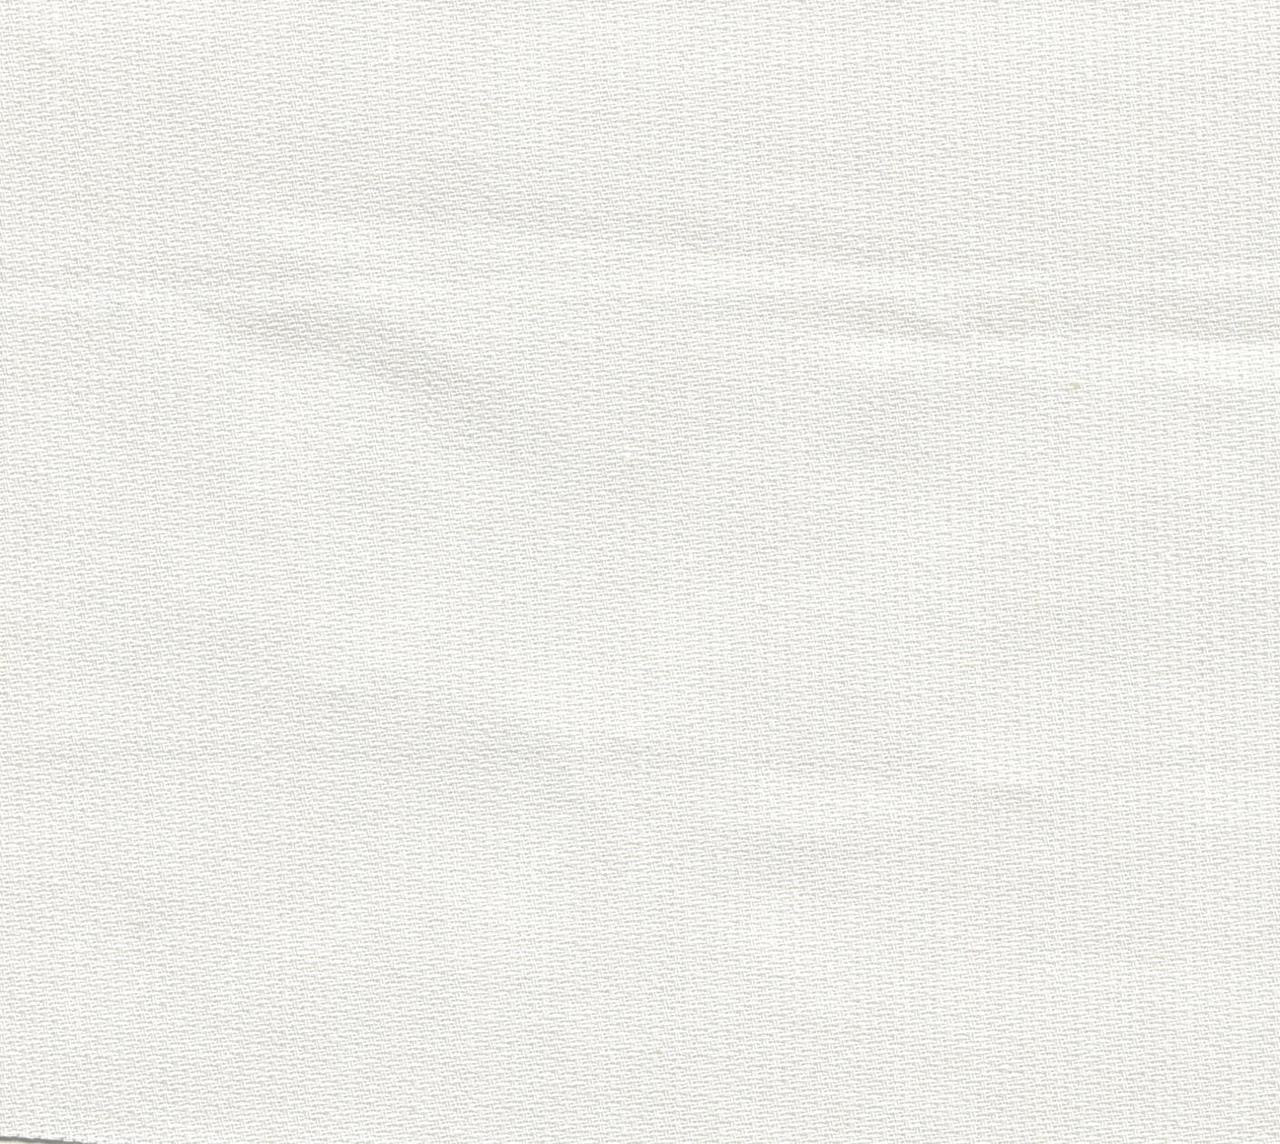 Ecru 100% Cotton Pima Wale Pique 145 cm